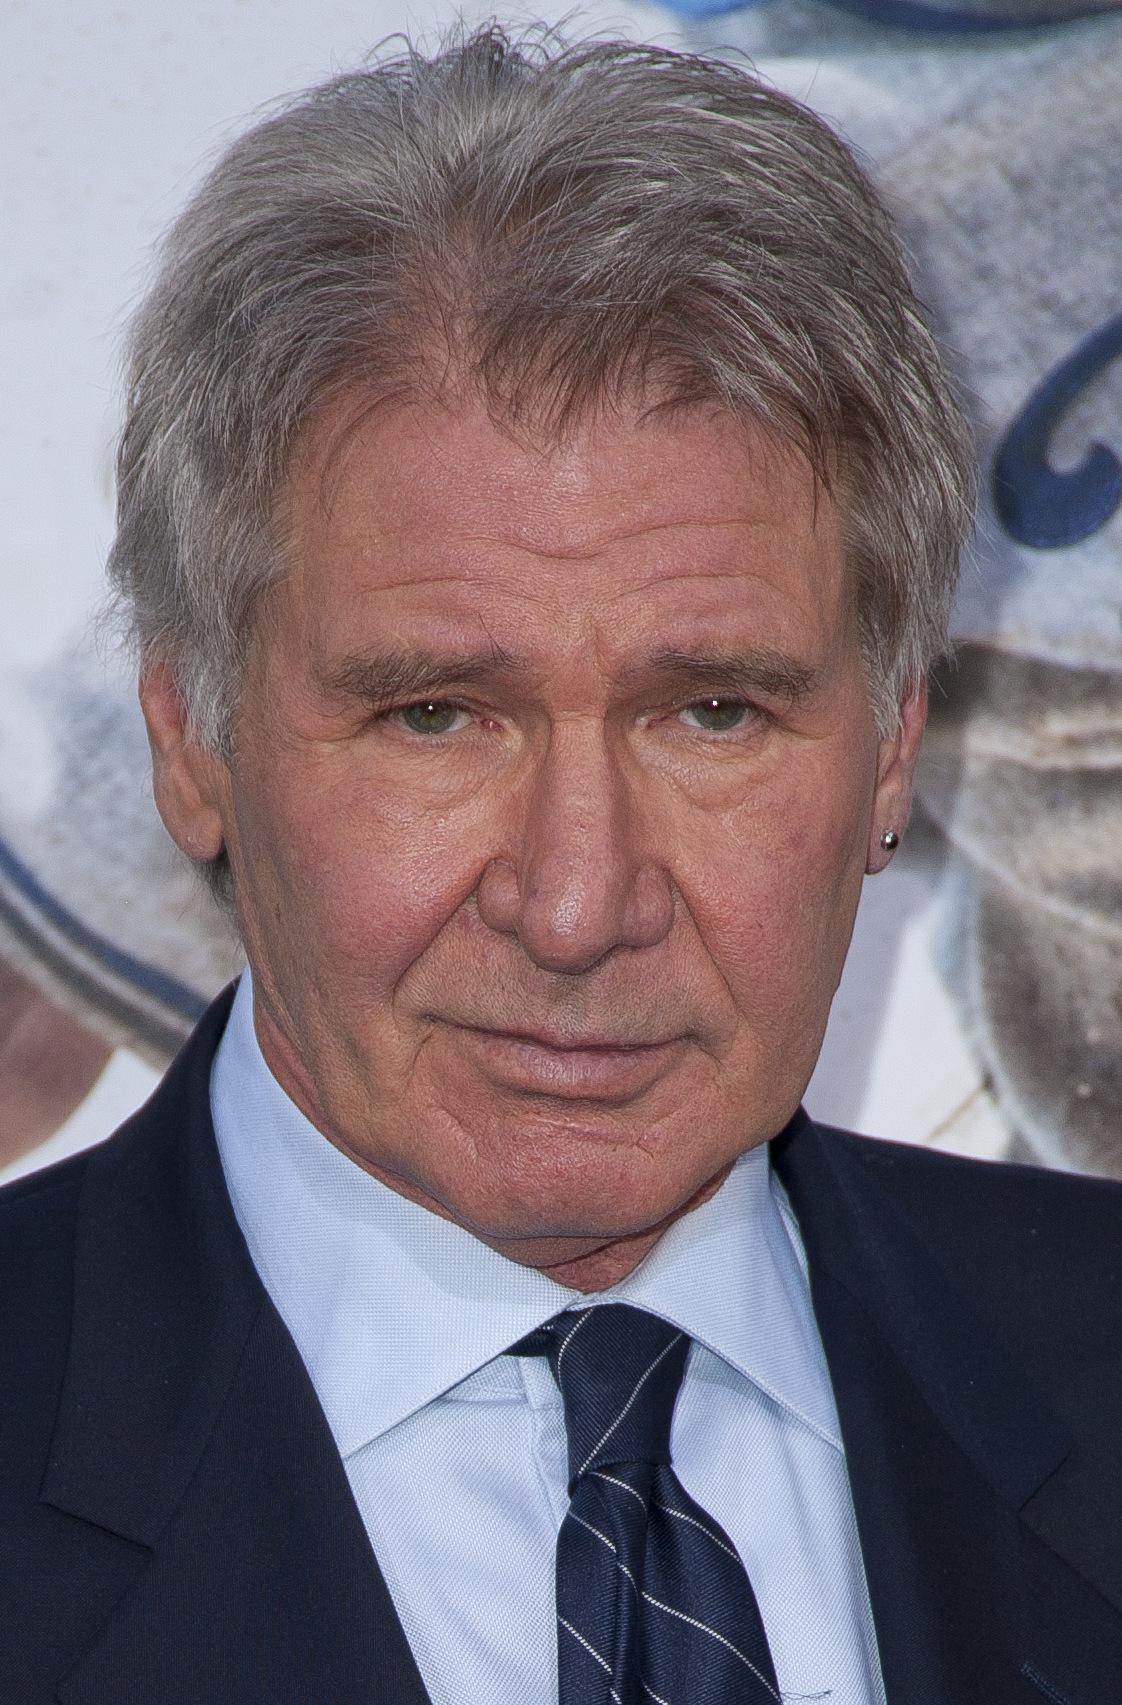 Harrison Ford, Amerikalı aktör tarihte bugün